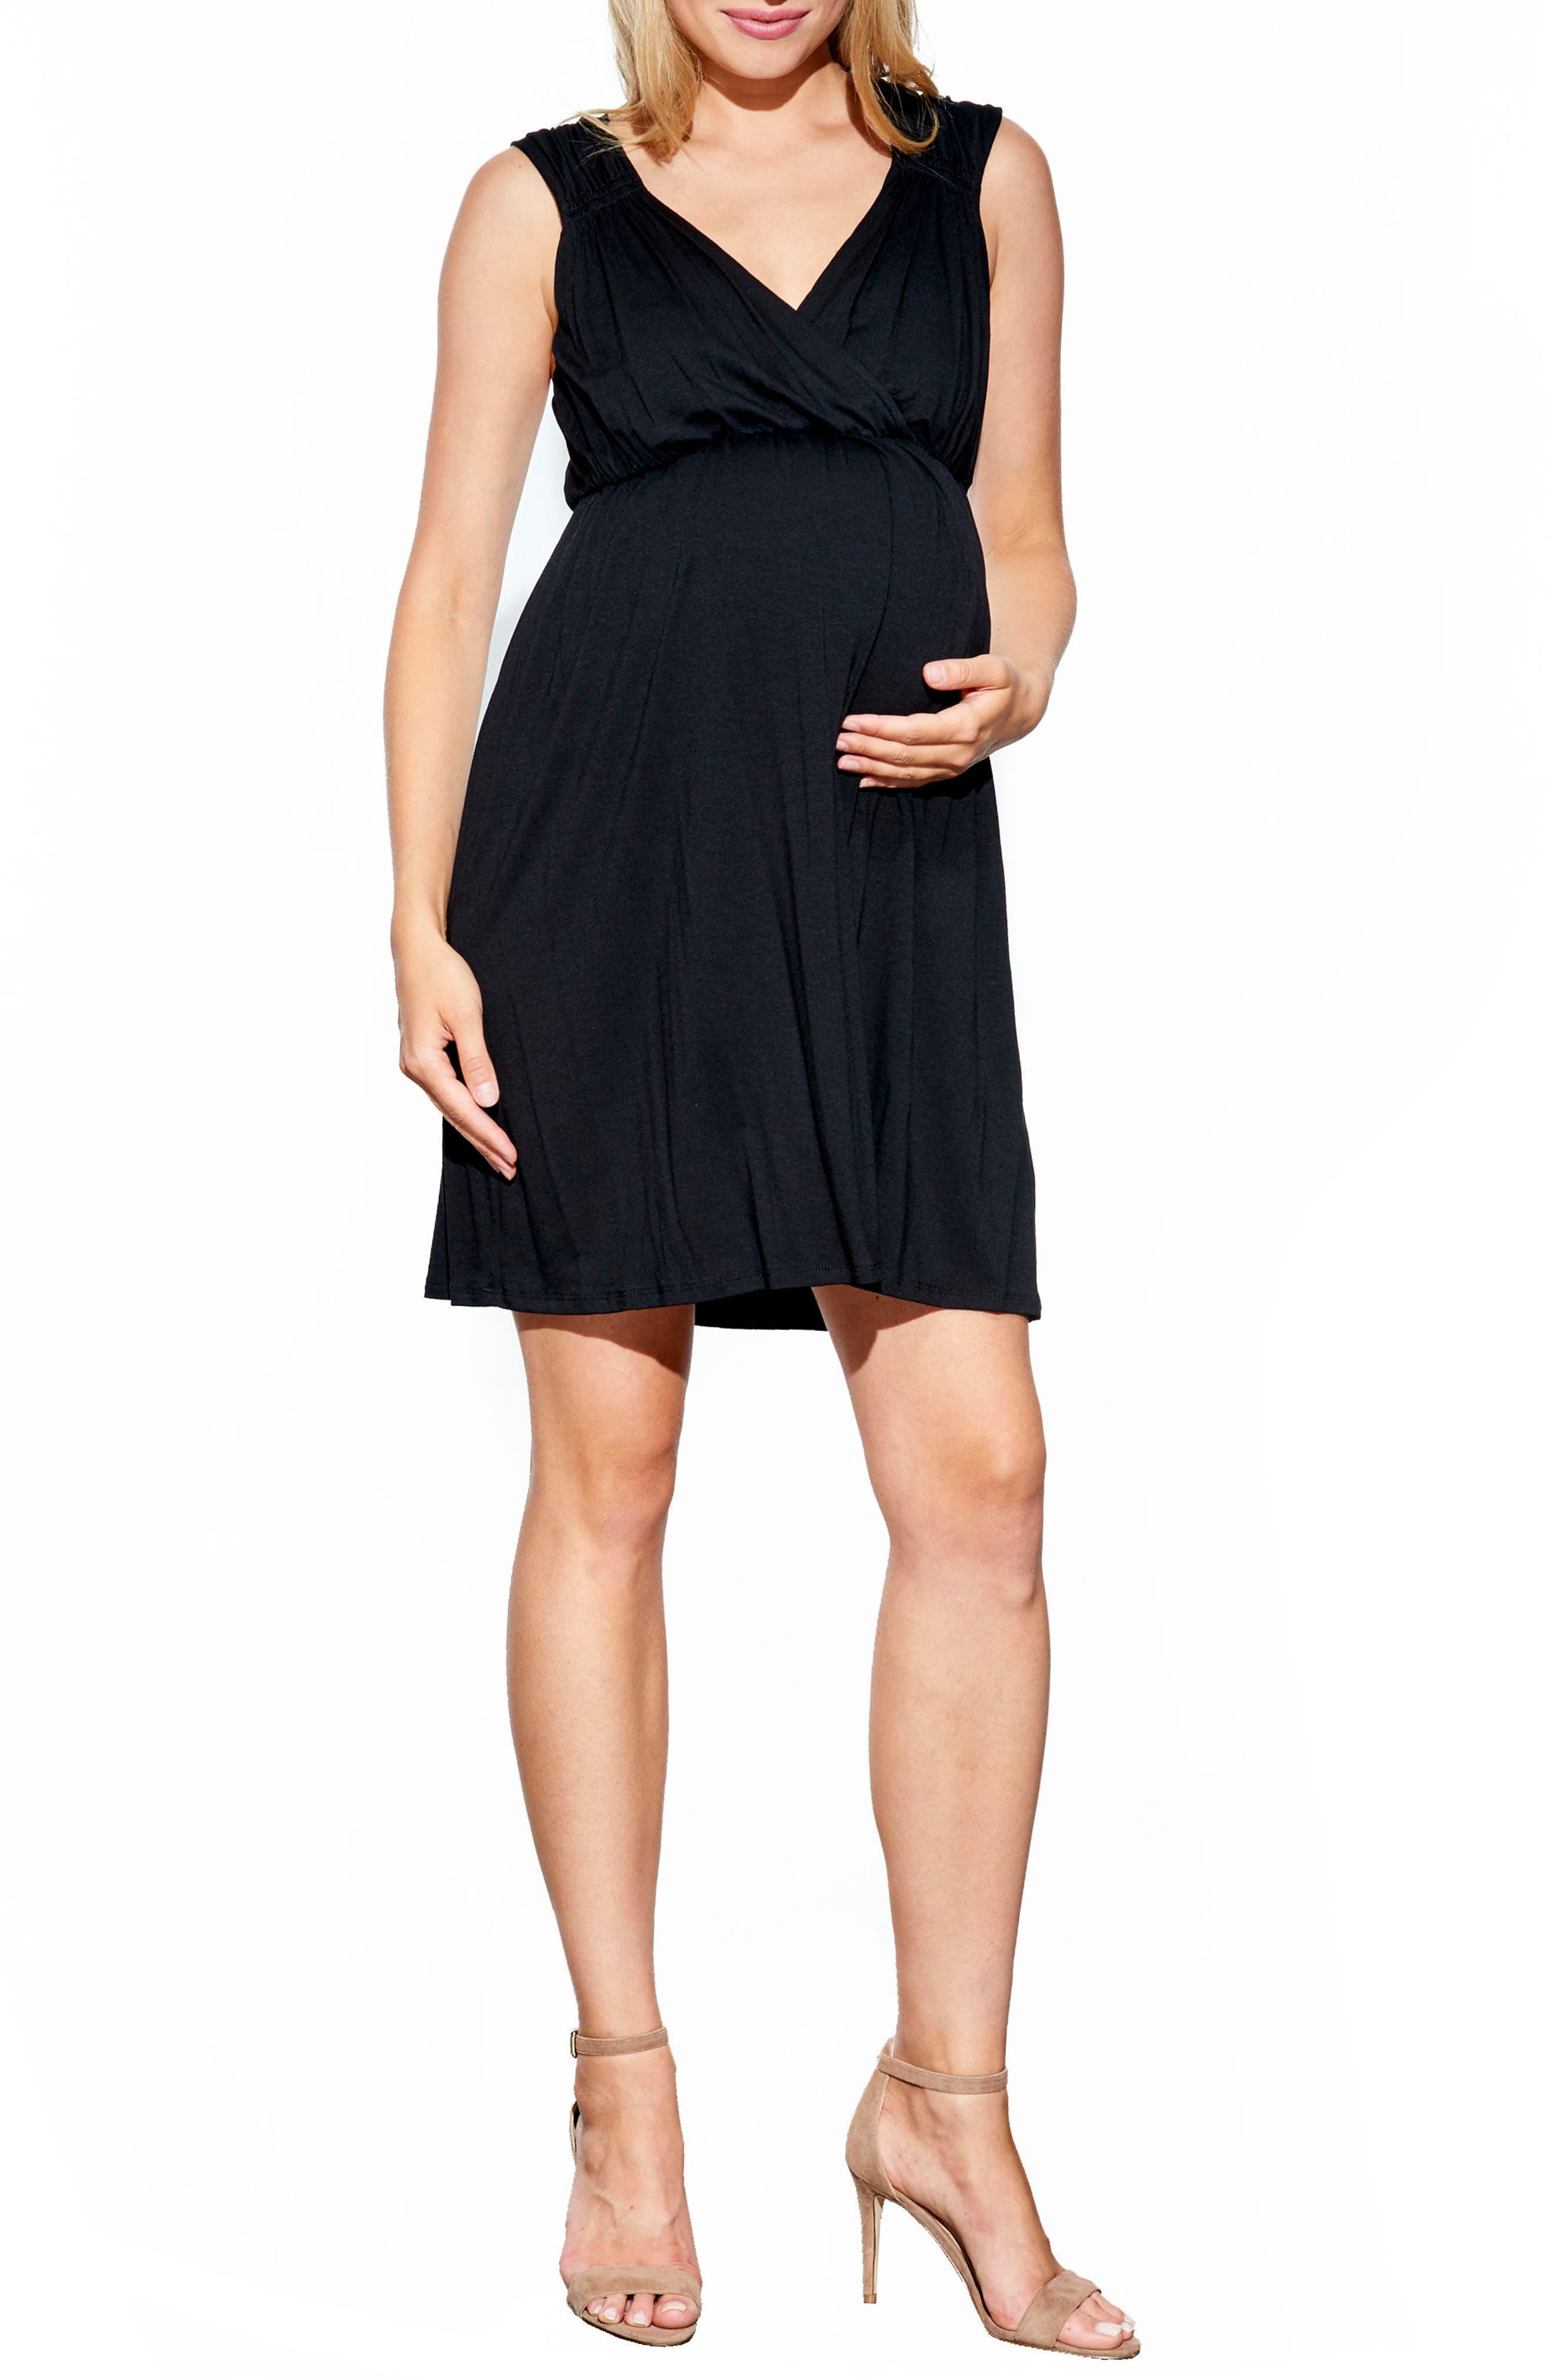 Alternate Image 1 Selected - Maternal America 'Vanessa' Maternity Dress